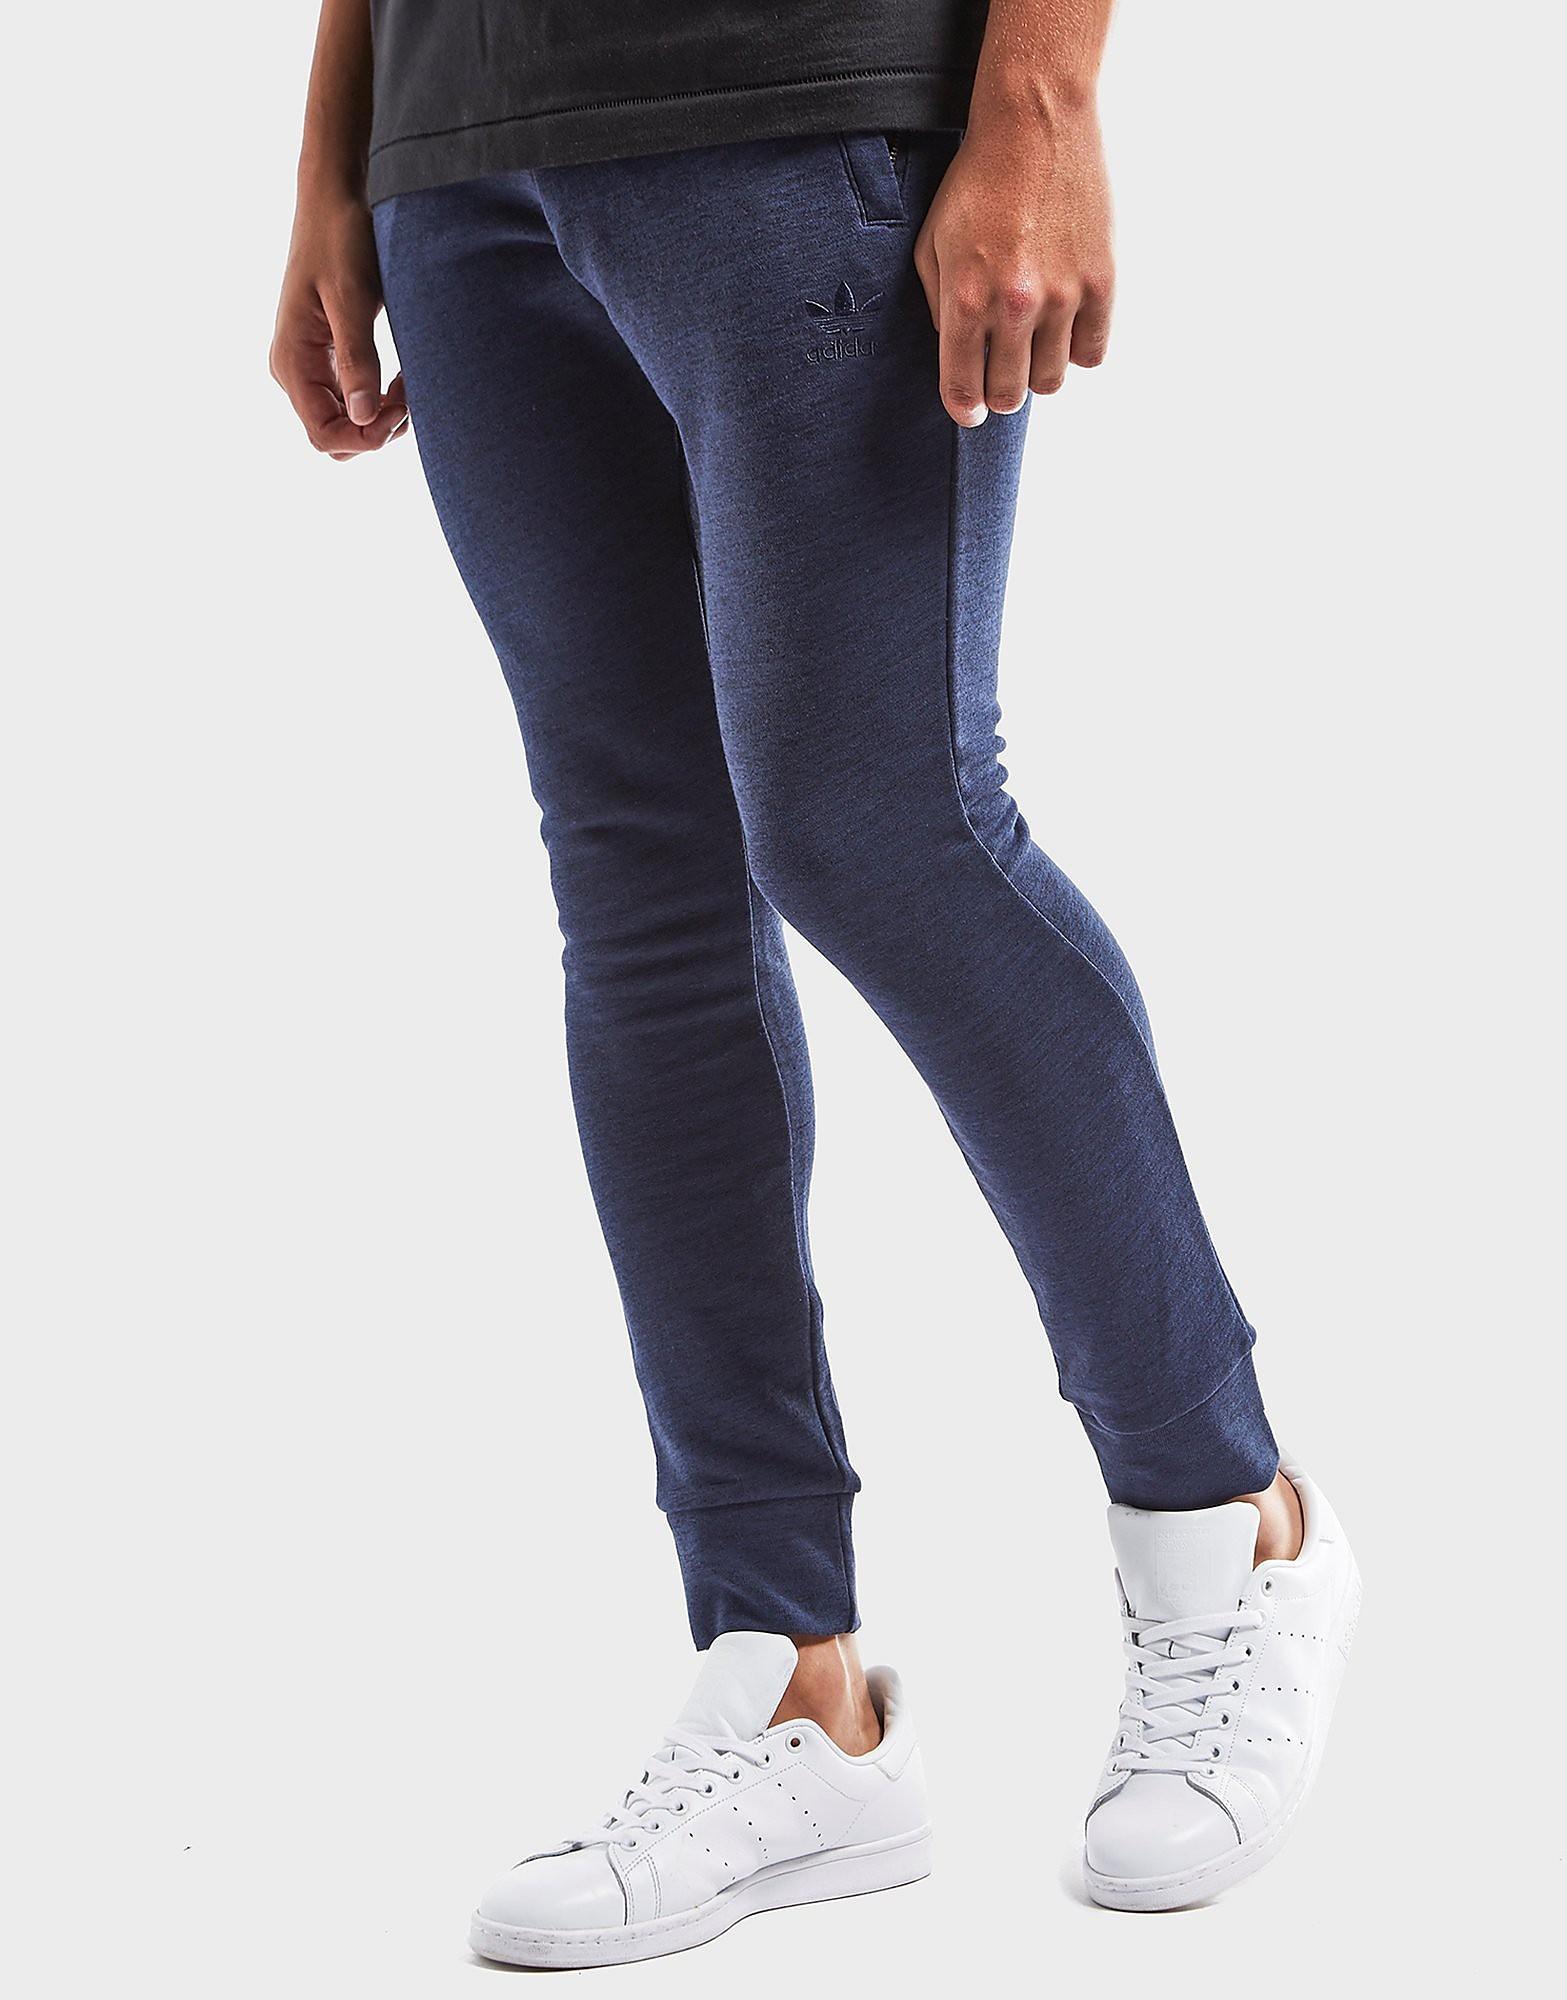 adidas Originals PT Trefoil Track Pants